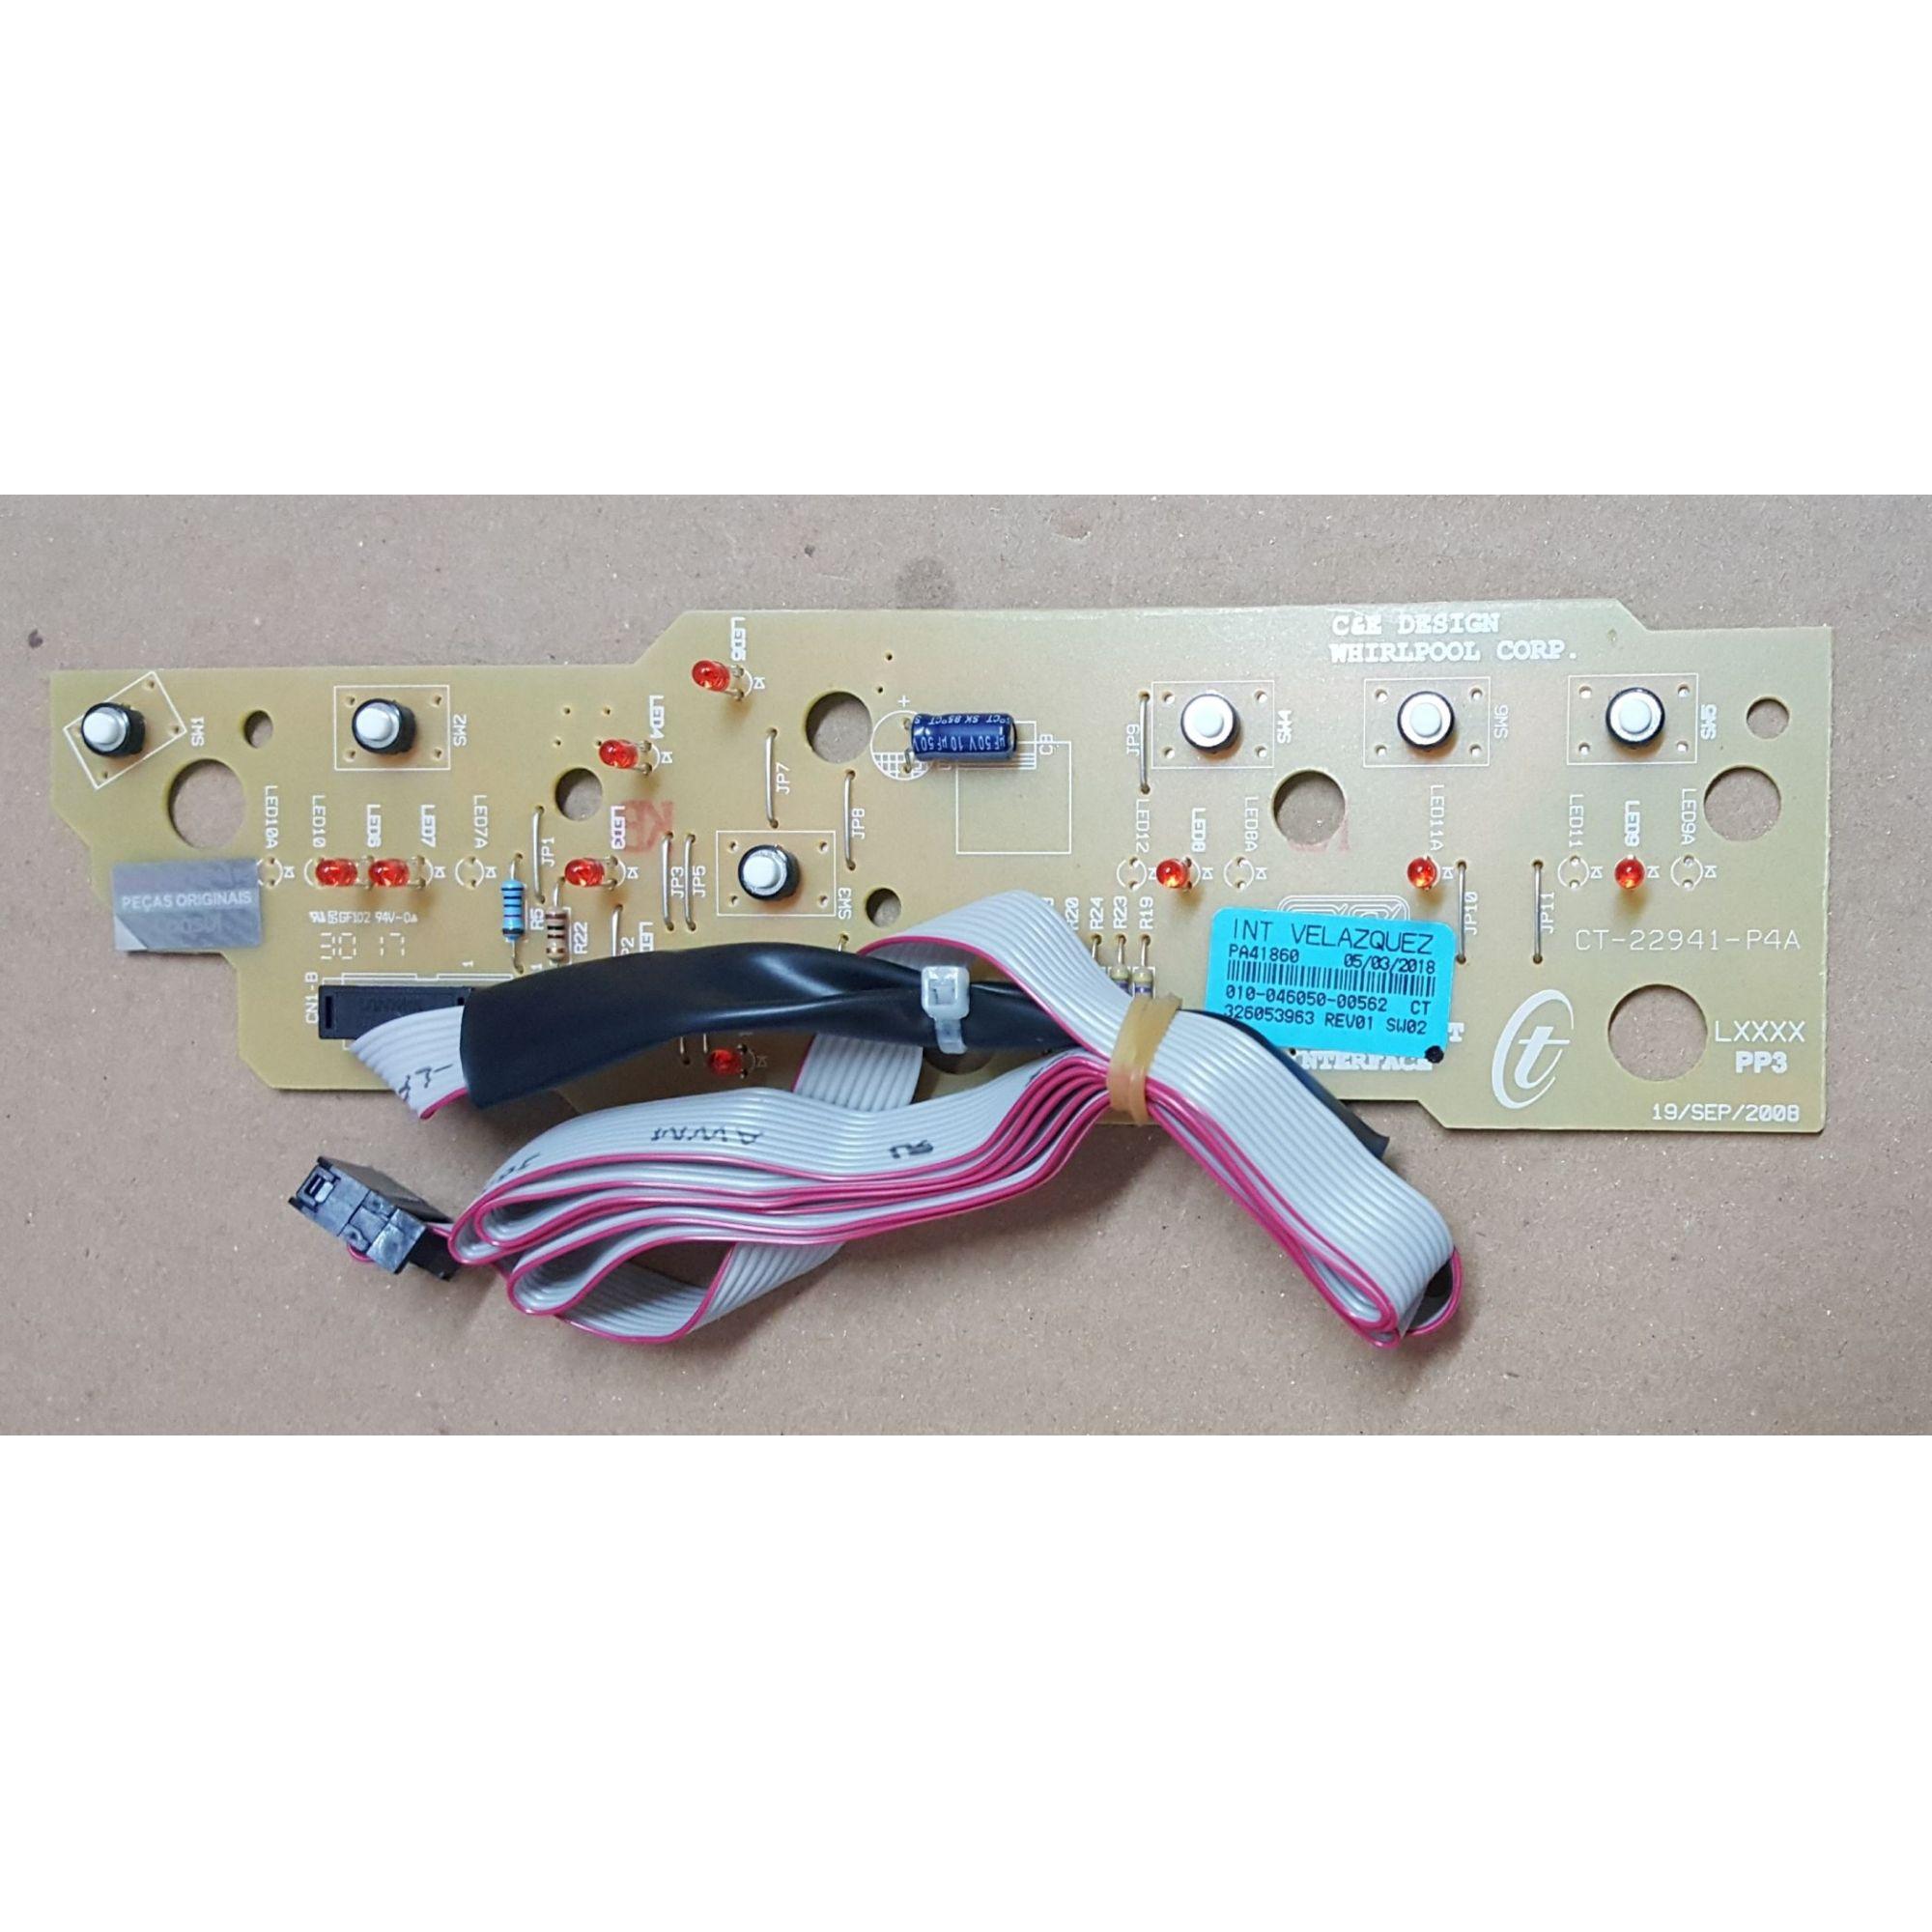 Placa Eletrônica Interface - Mod: BWF09 / BWG10A